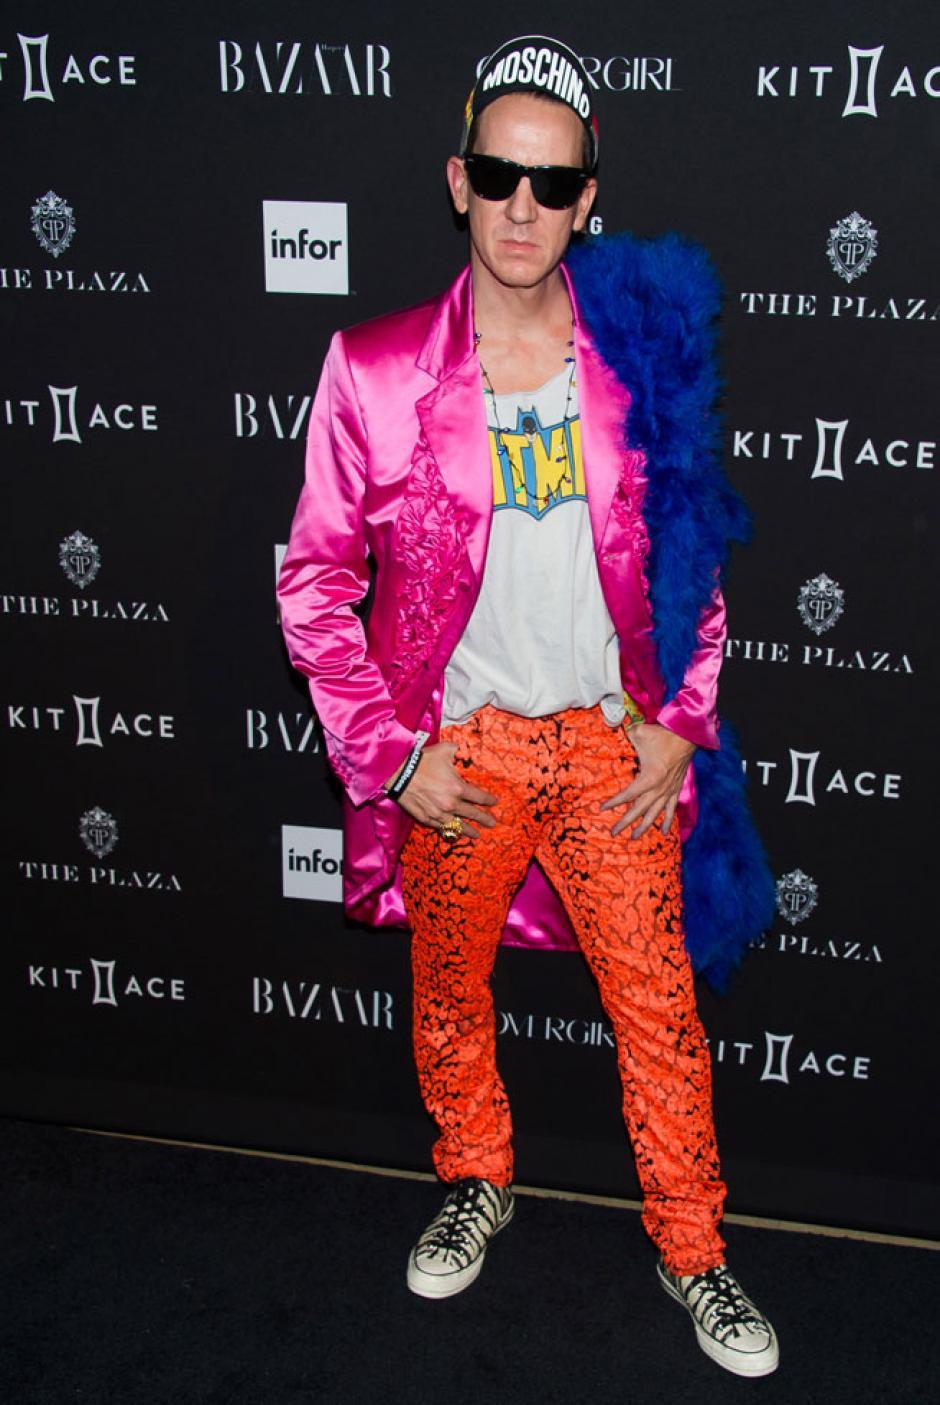 El diseñador de moda Jeremy Scott decidió desafiar al sistema con color. (Foto: GTRES)